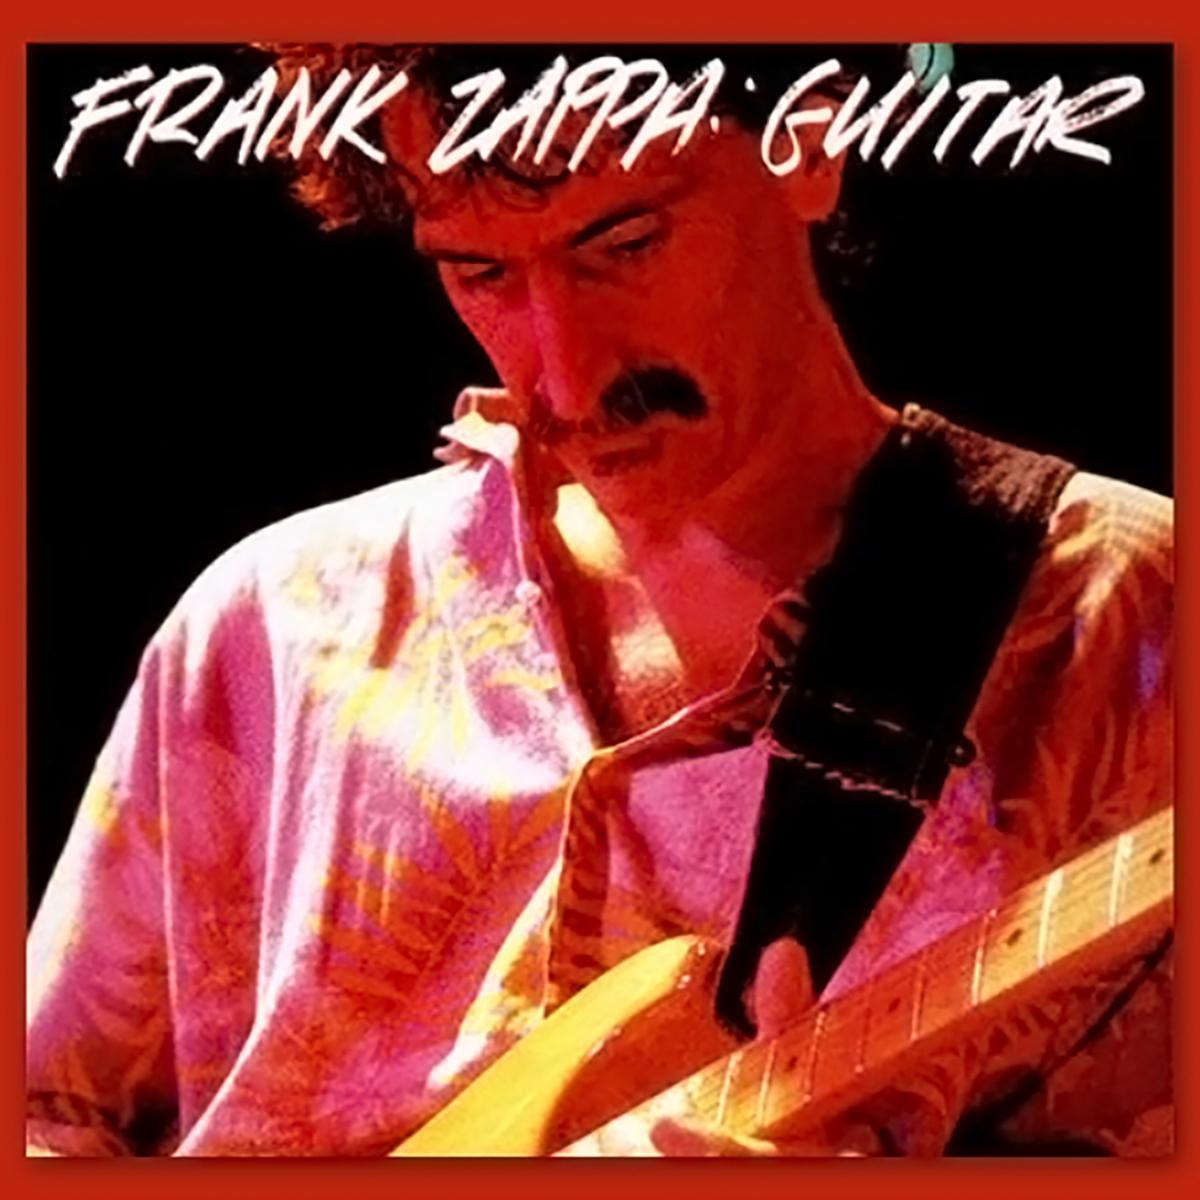 Frank Zappa - Guitar (1988)